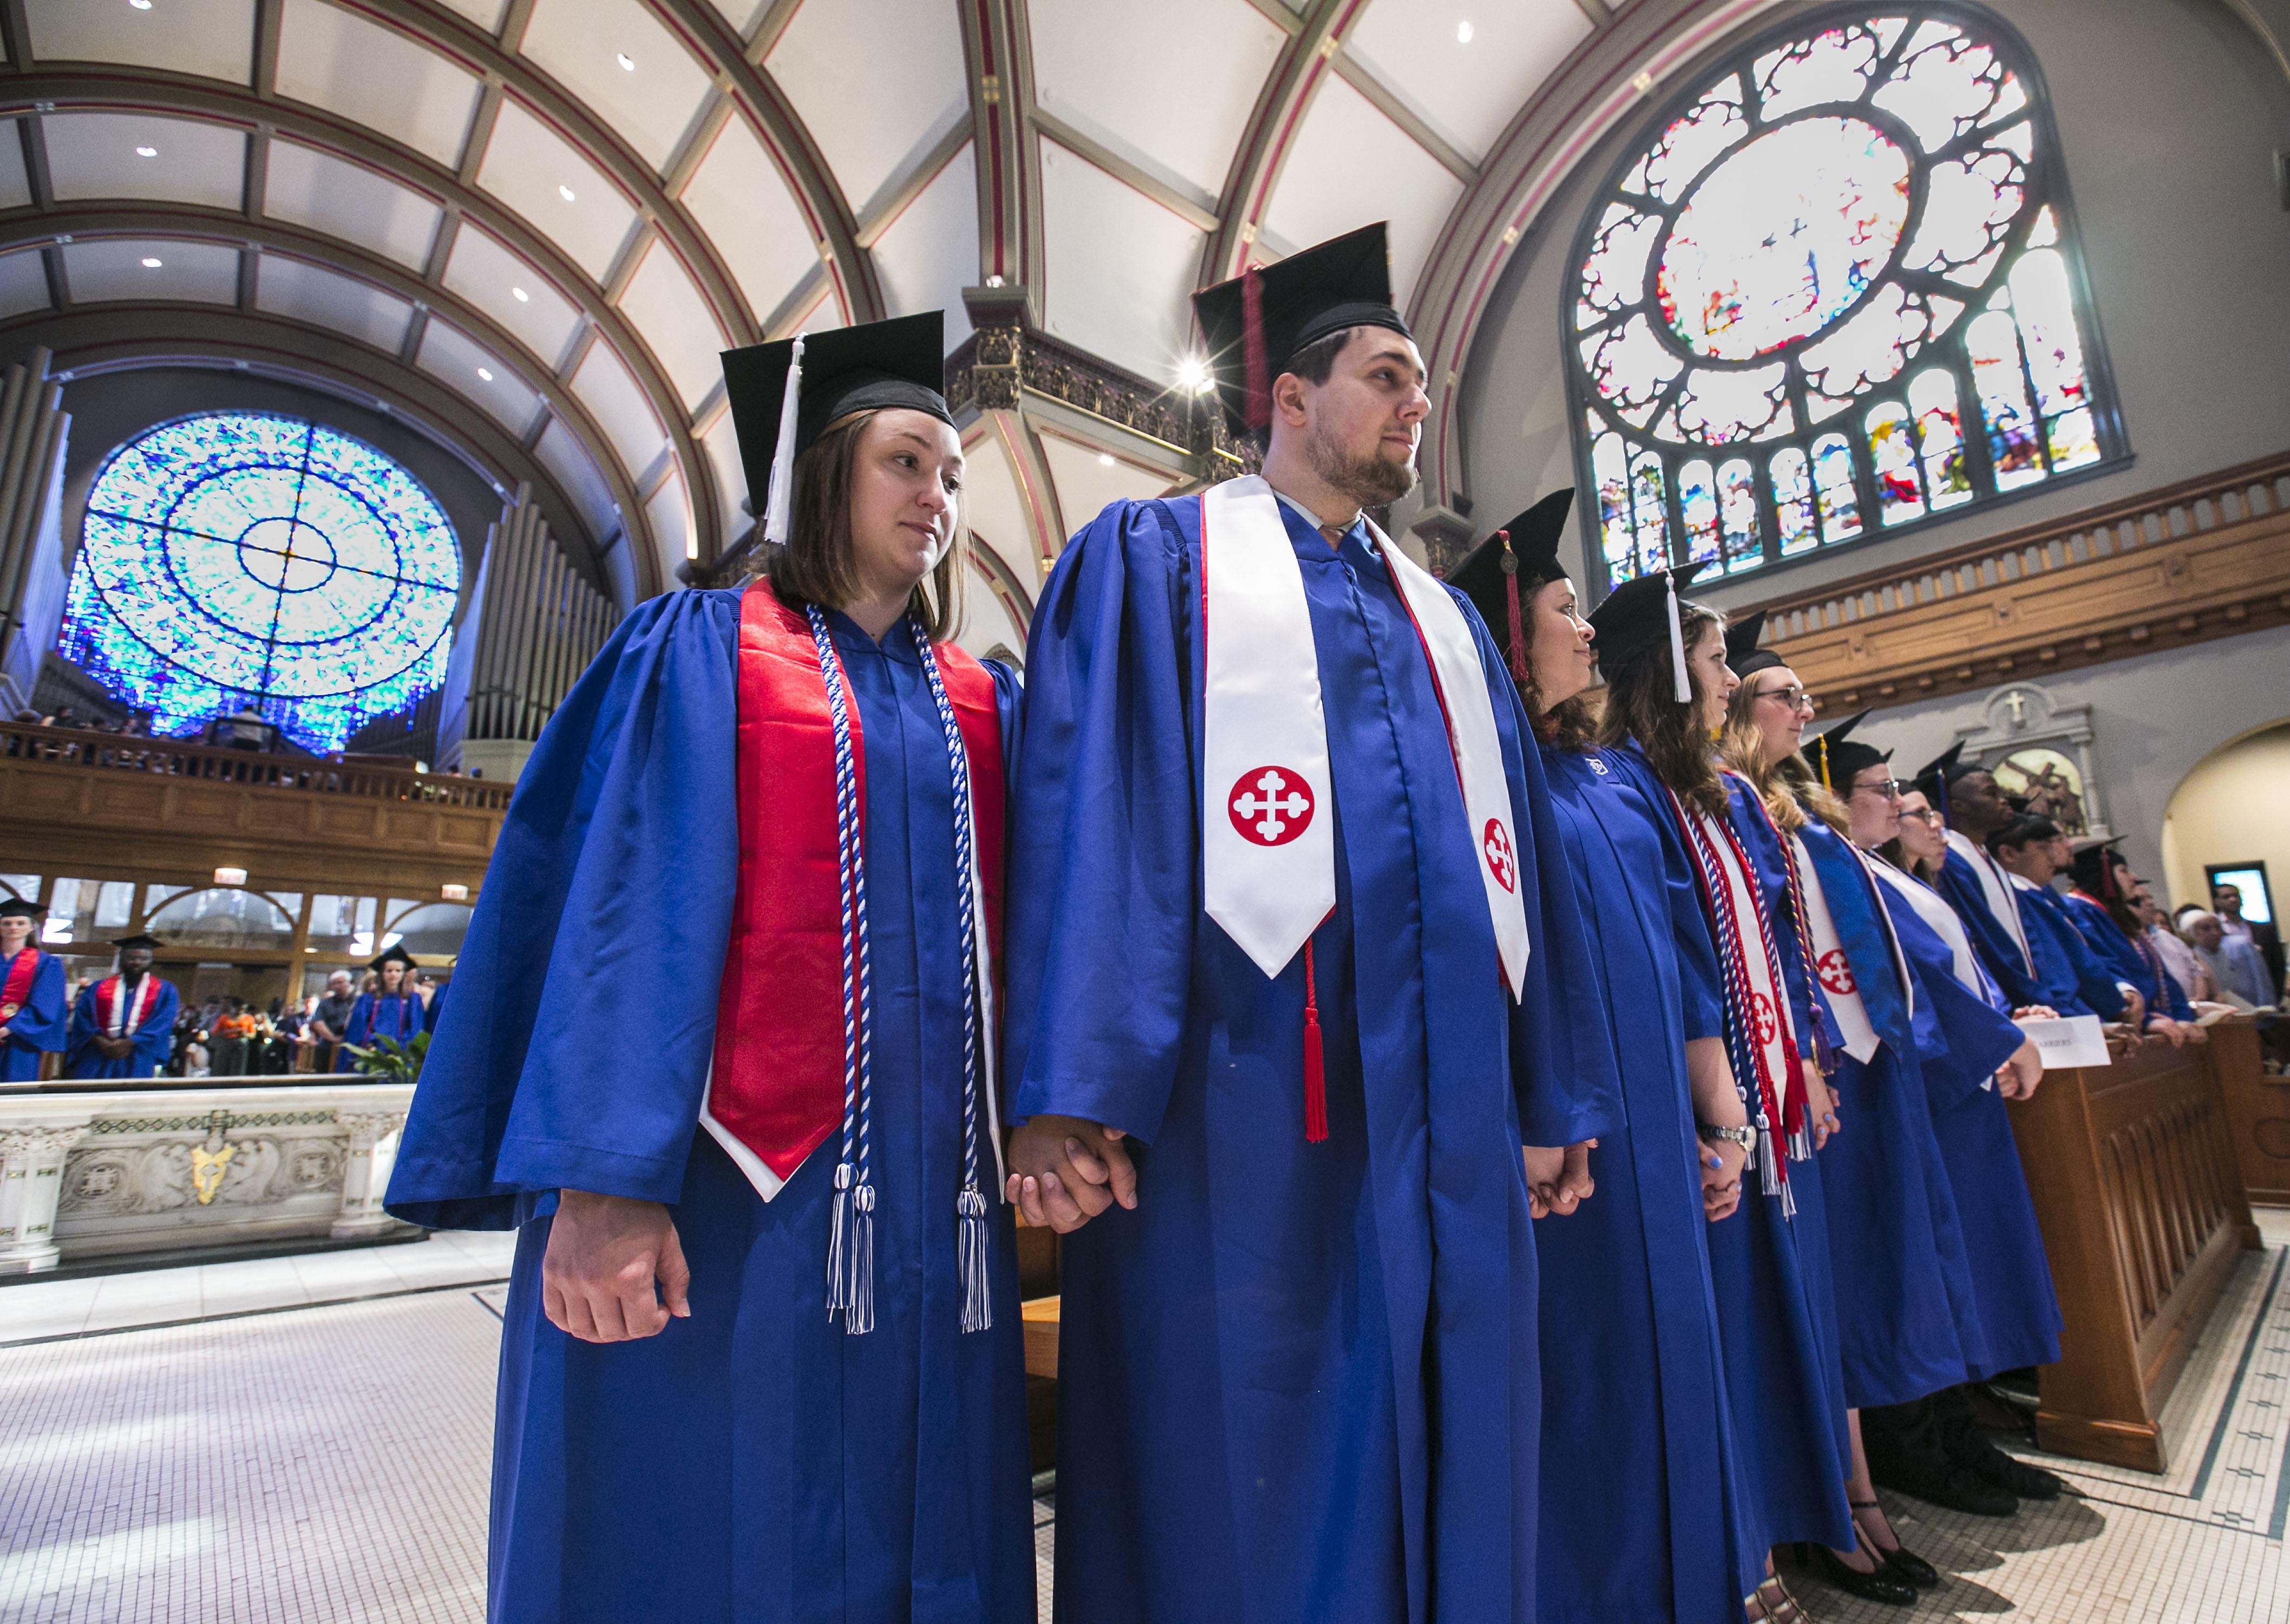 Baccalaureate Mass | Ceremonies & Events | Commencement | DePaul ...